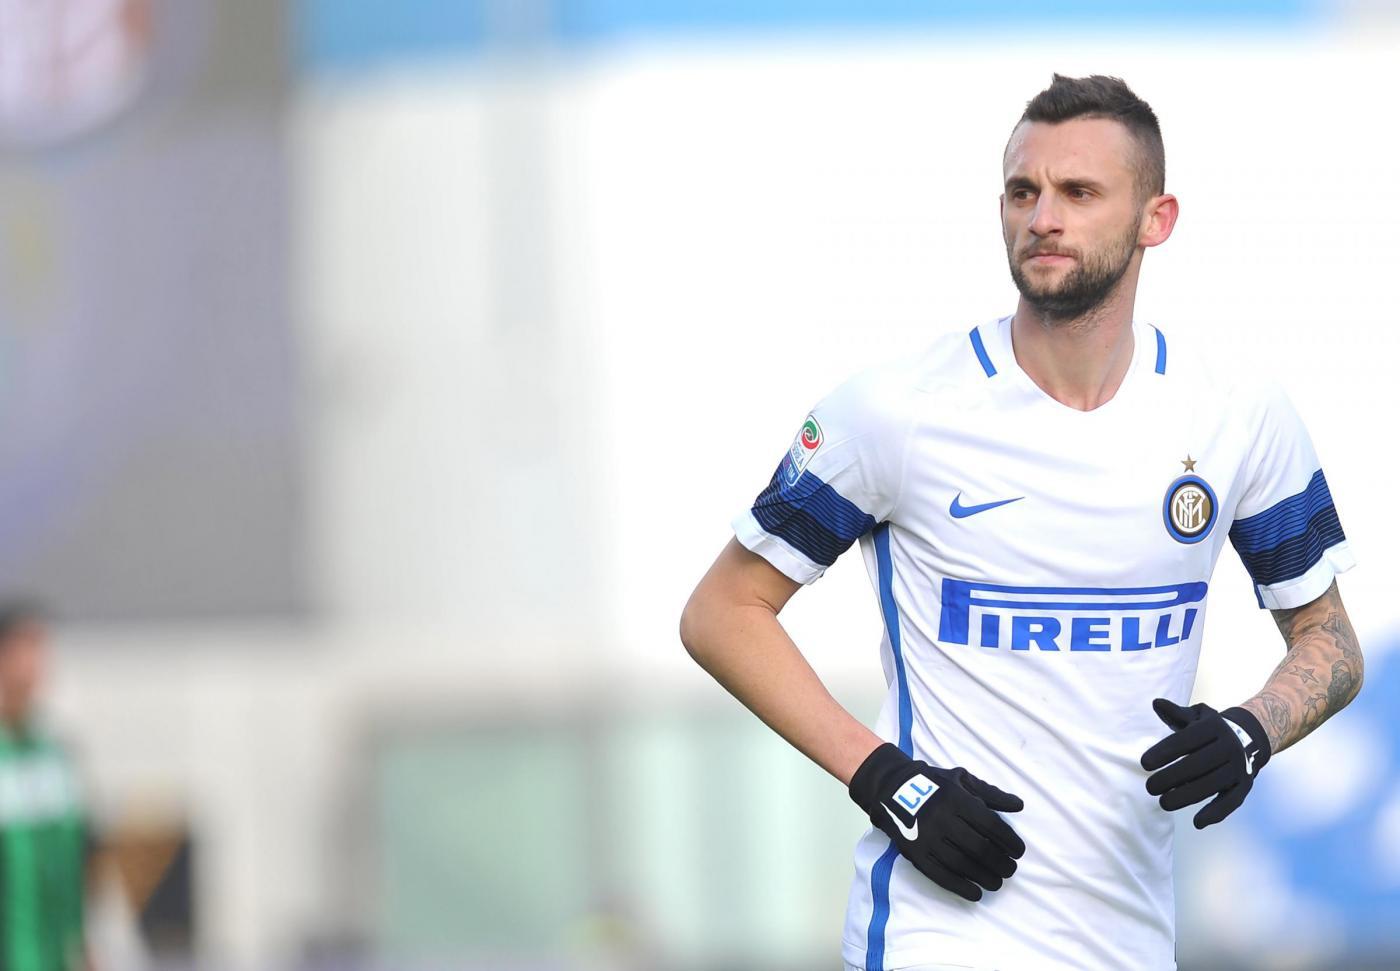 Cuadrado Inter, possibile scambio con la Juventus per Brozovic